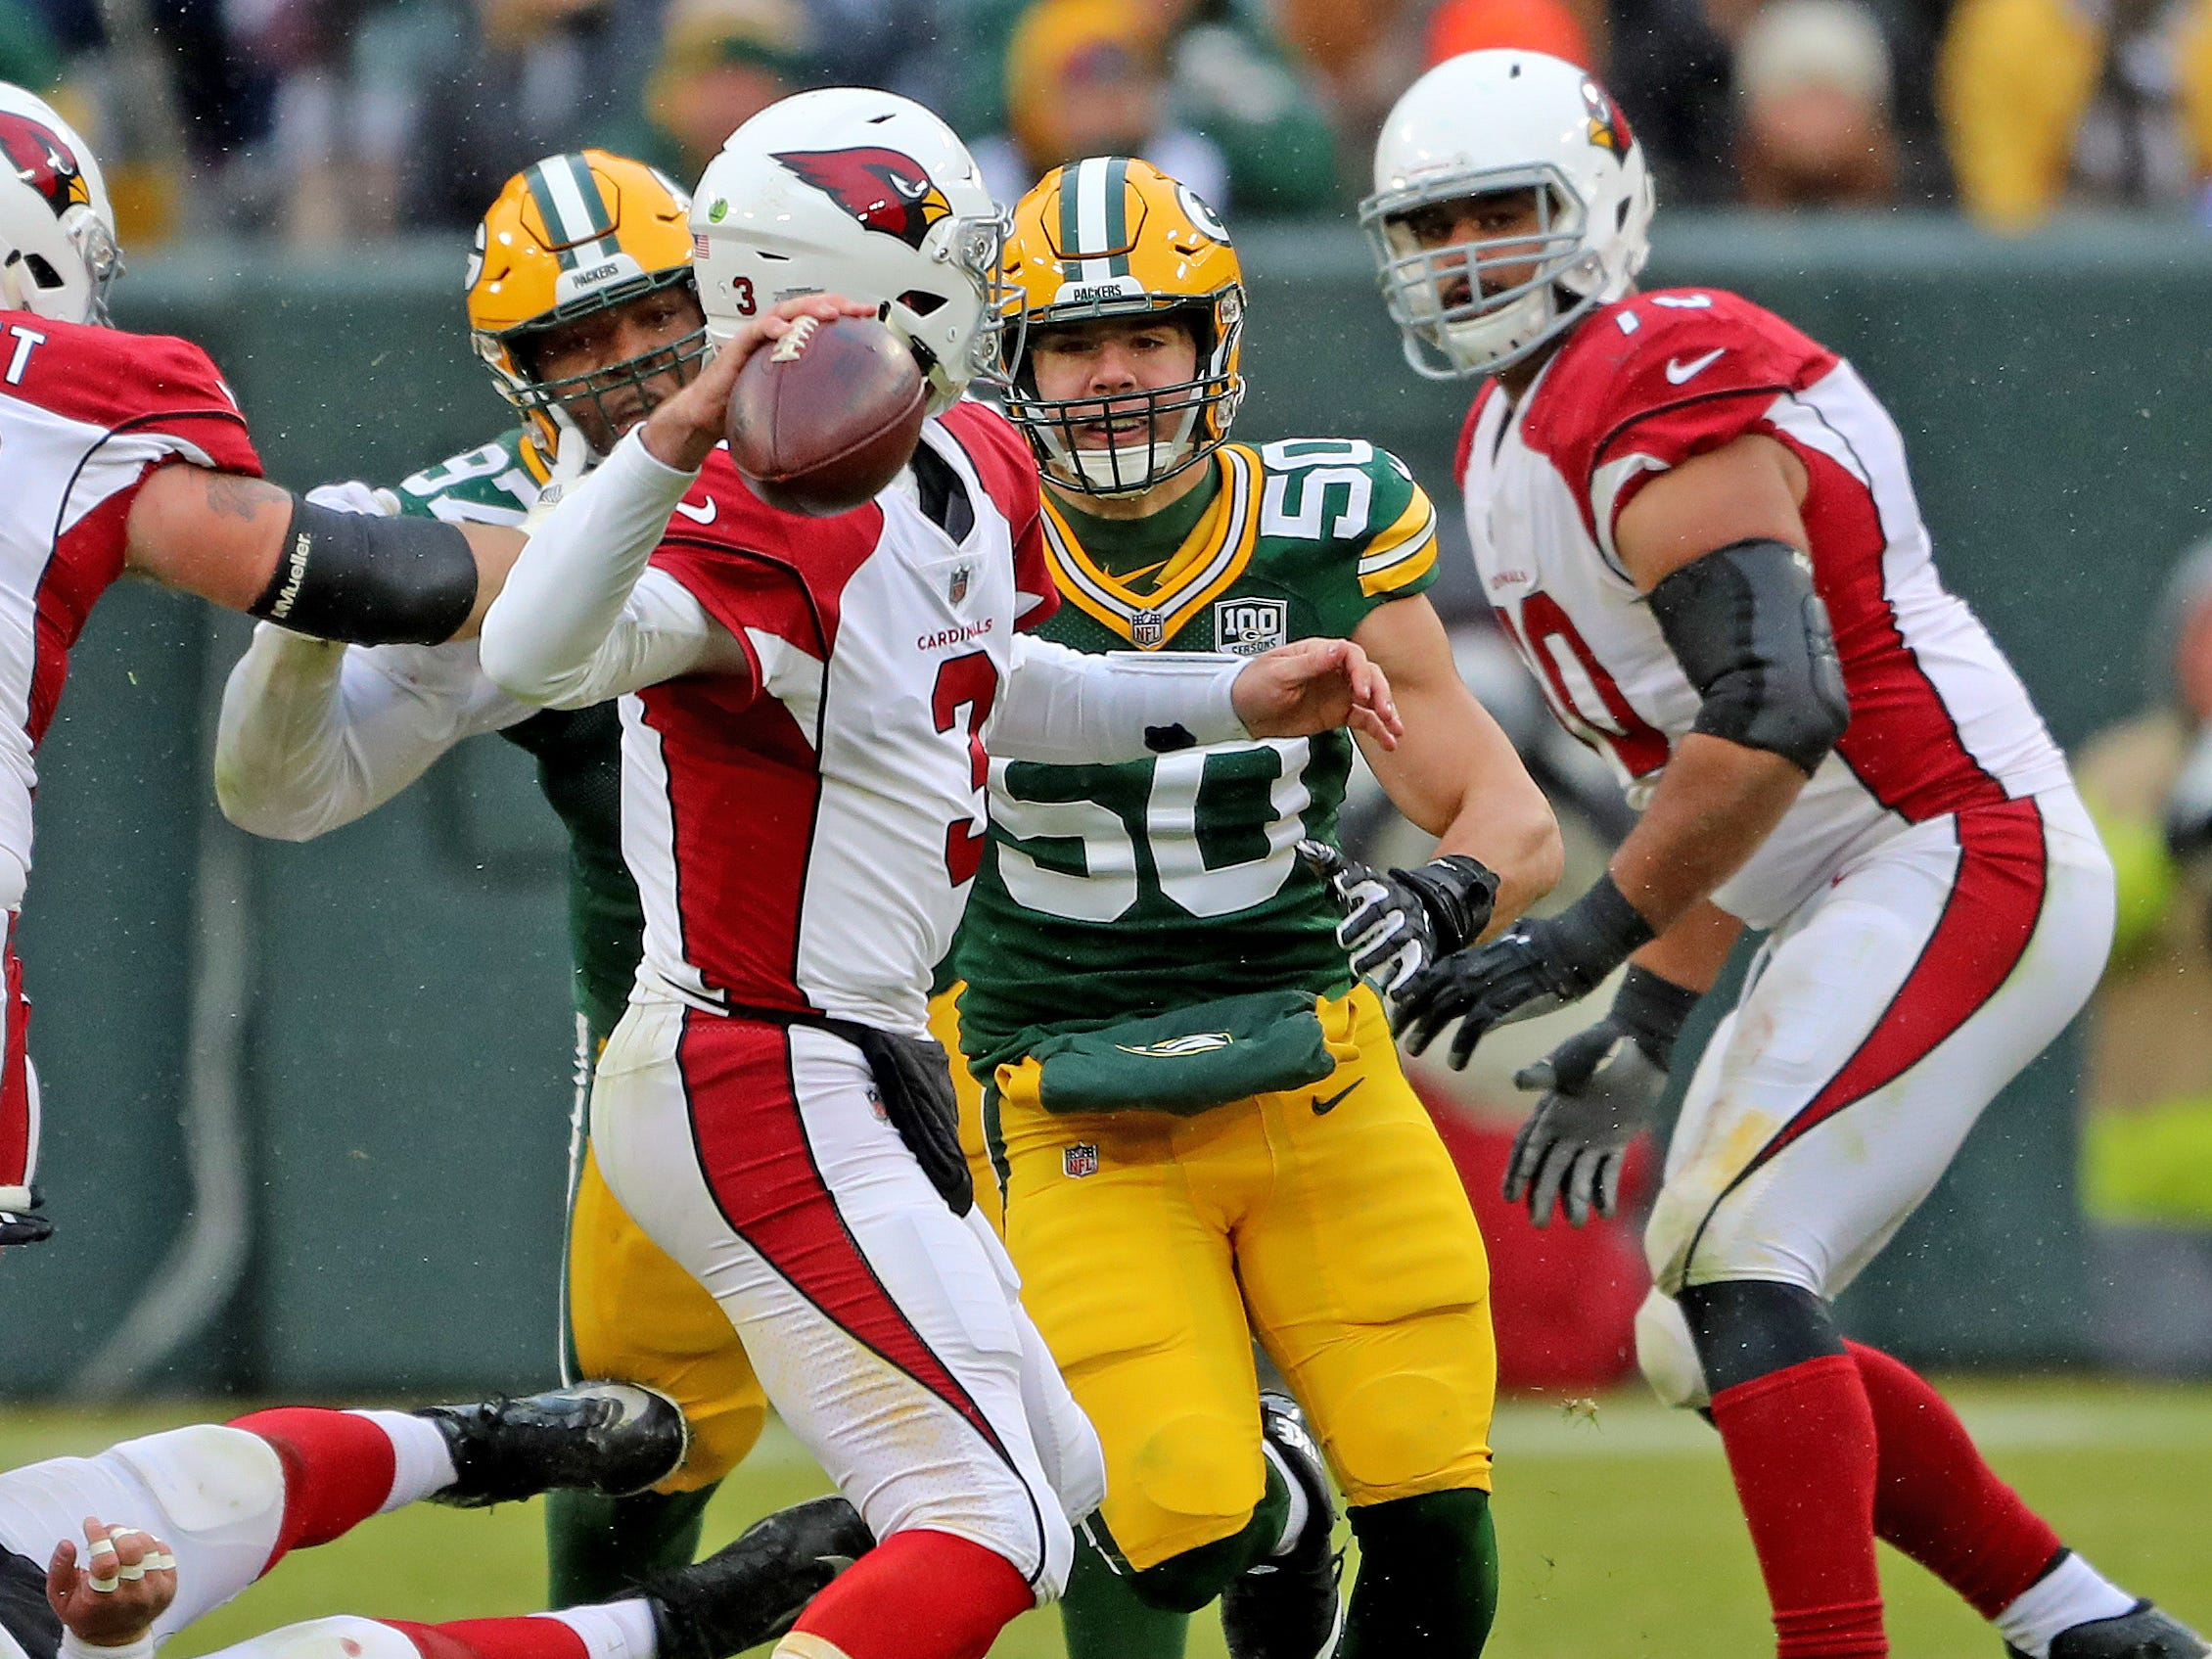 Green Bay Packers inside linebacker Blake Martinez (50) pressures quarterback Josh Rosen (3) against the Arizona Cardinals Sunday, December 2, 2018 at Lambeau Field in Green Bay, Wis. Jim Matthews/USA TODAY NETWORK-Wis